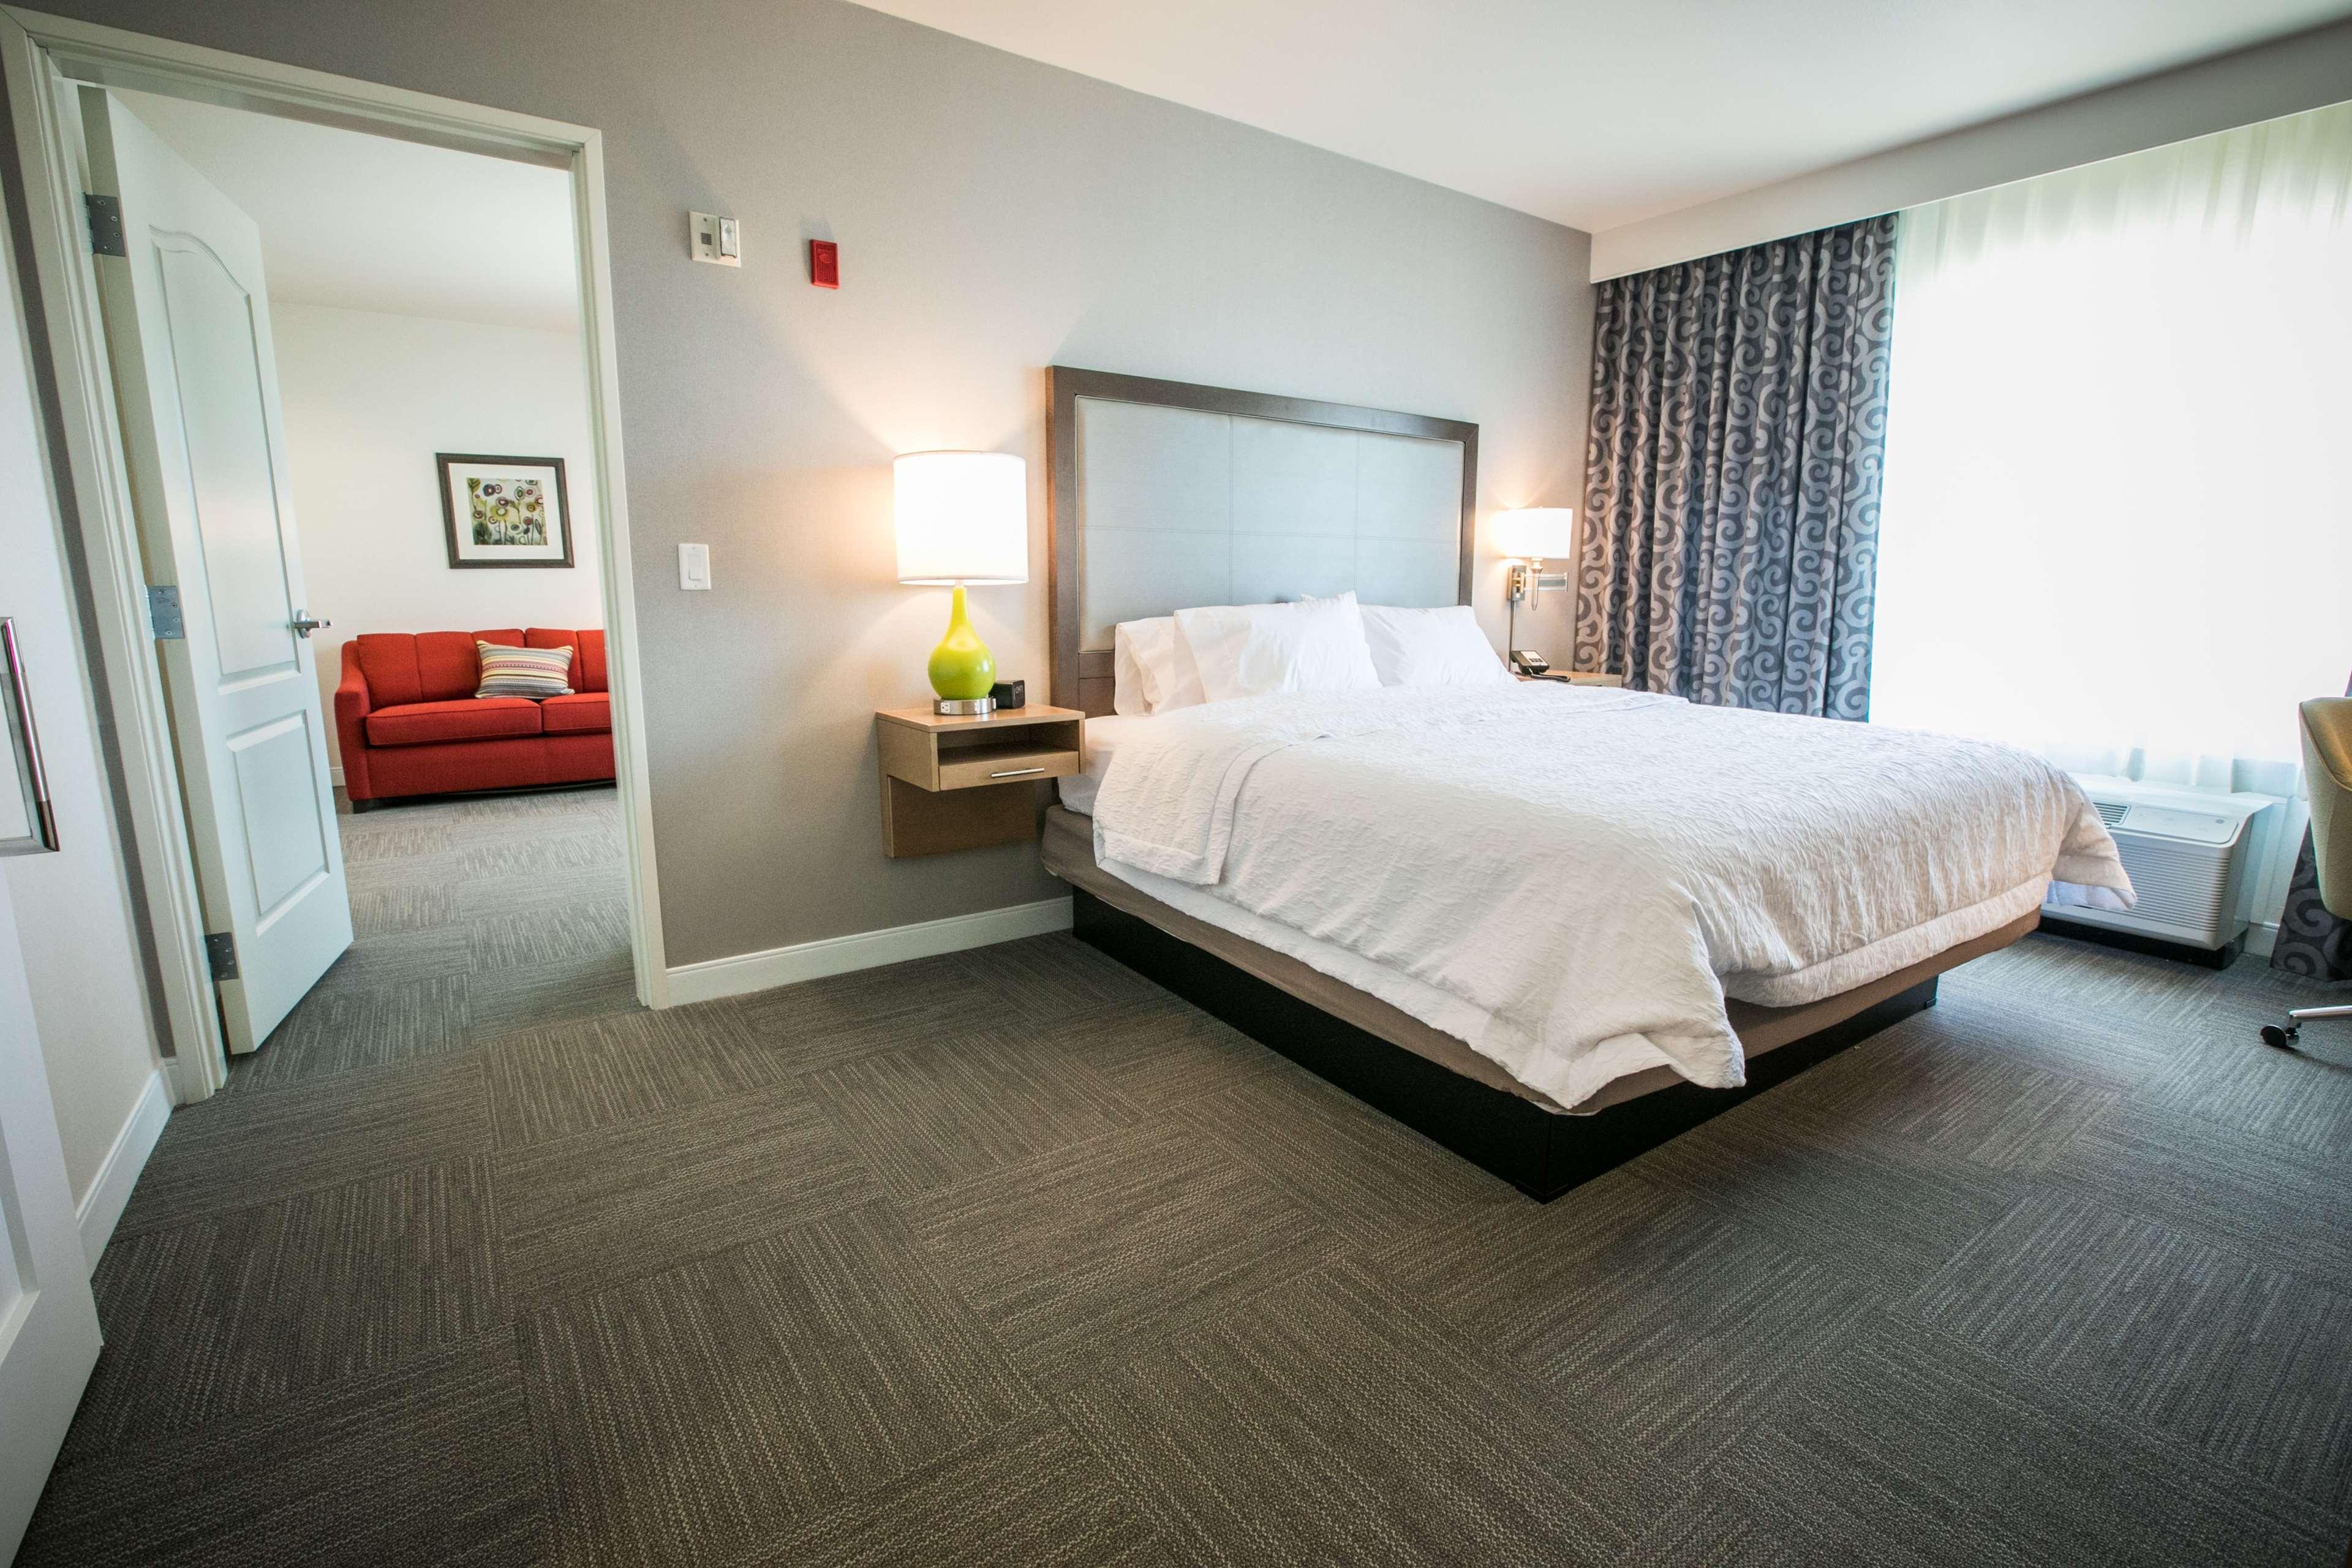 Hampton Inn & Suites Tempe - Phoenix Airport image 18